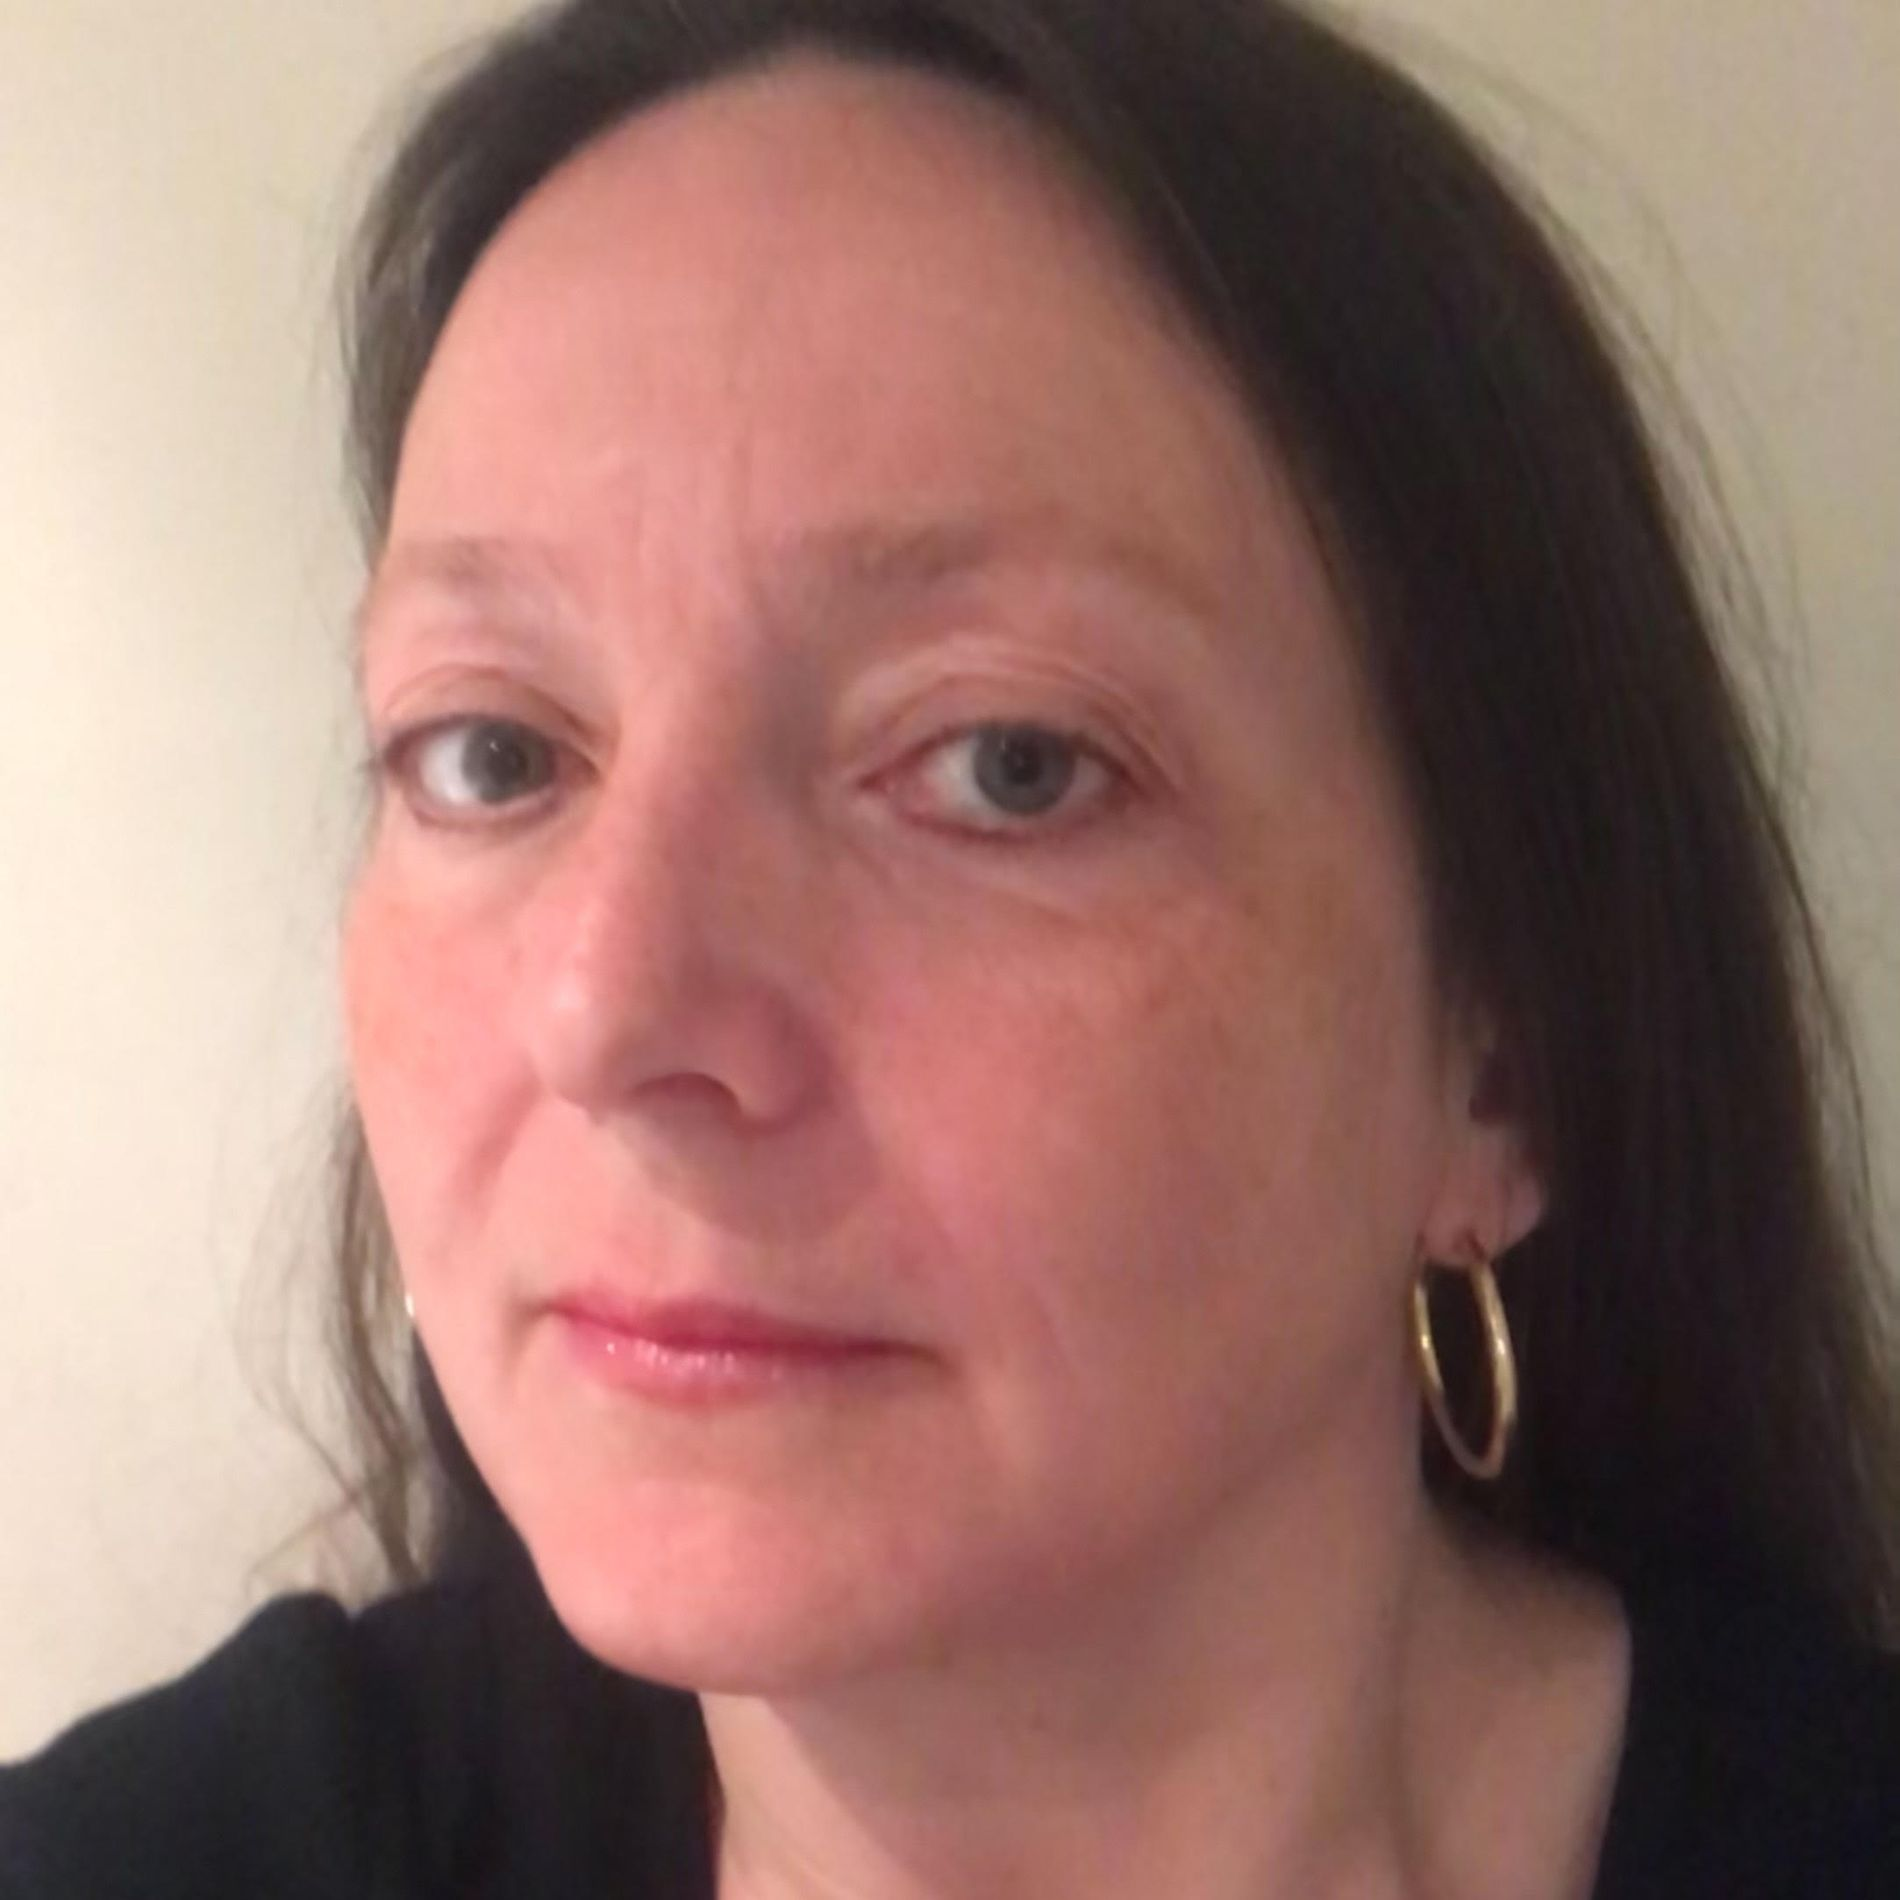 Anita Grøtte Edland